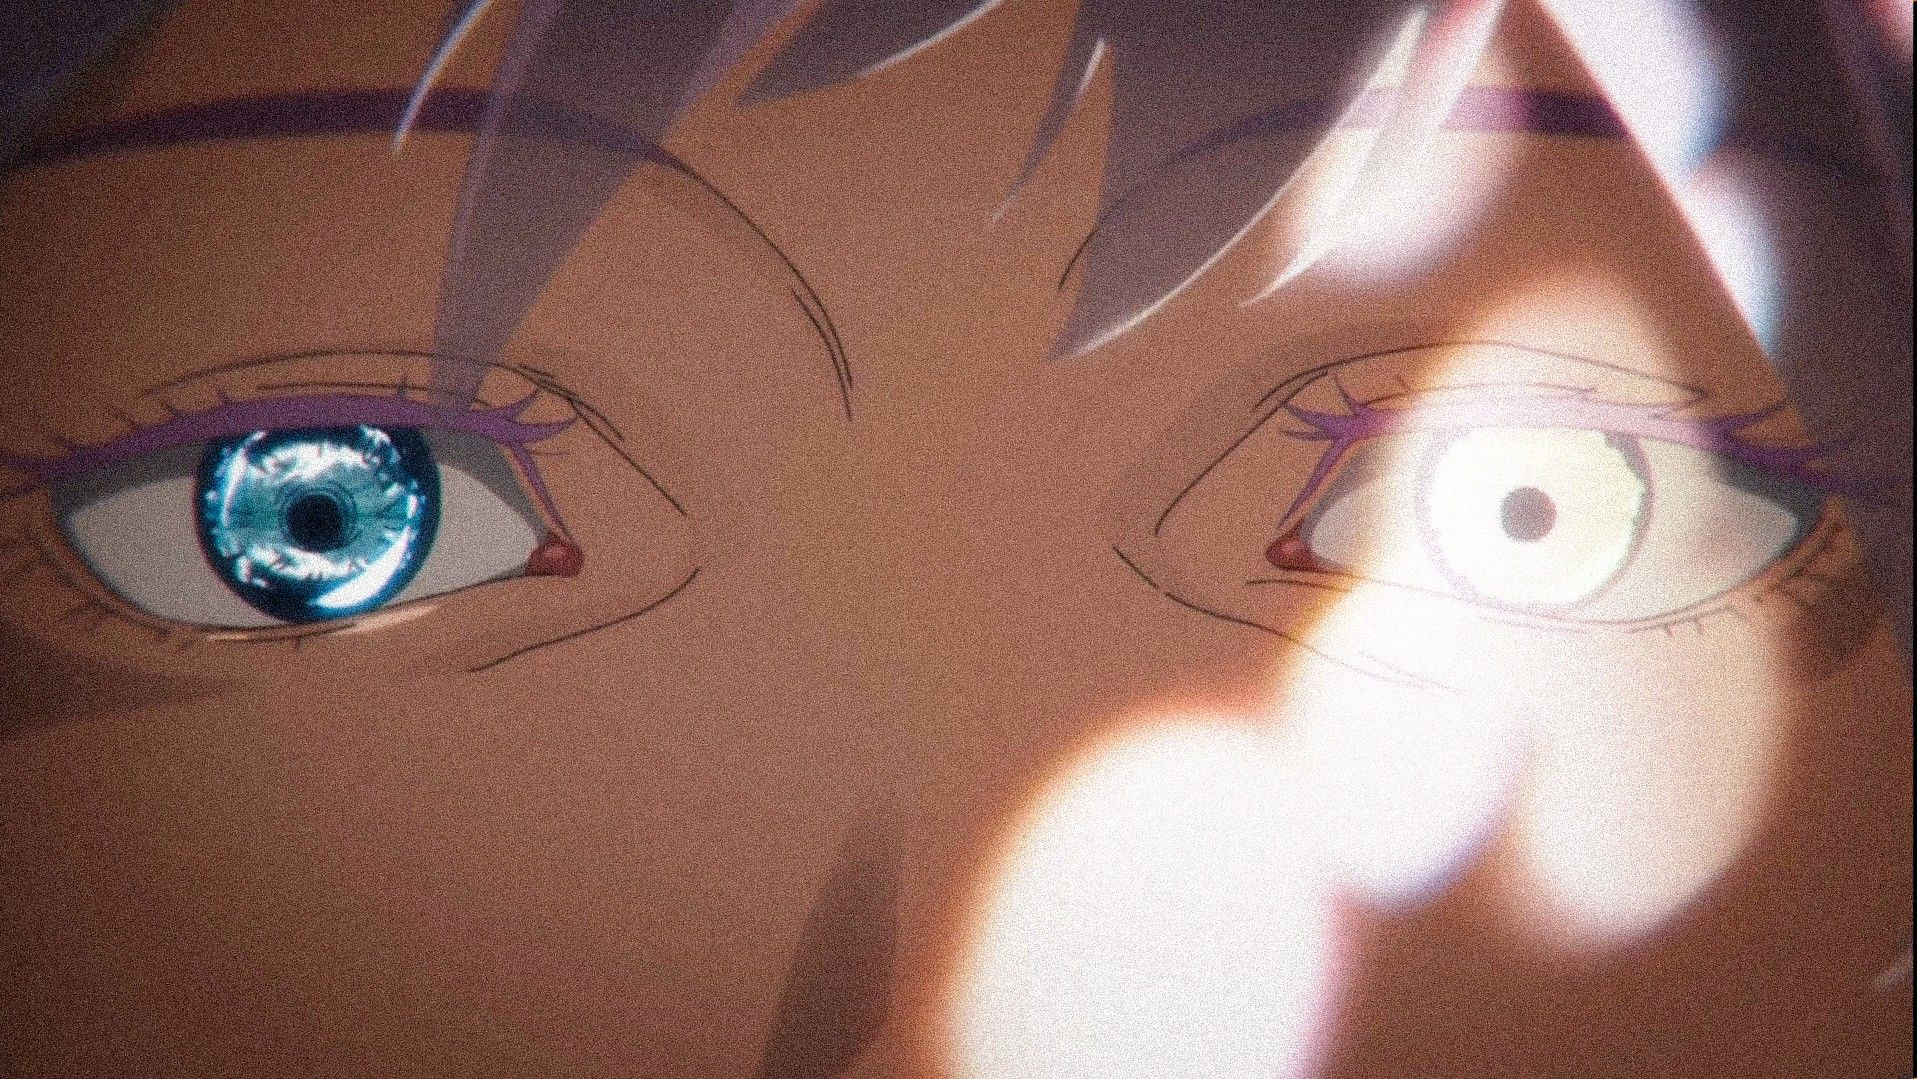 Fim On Twitter In 2021 Impact Anime Anime Eyes